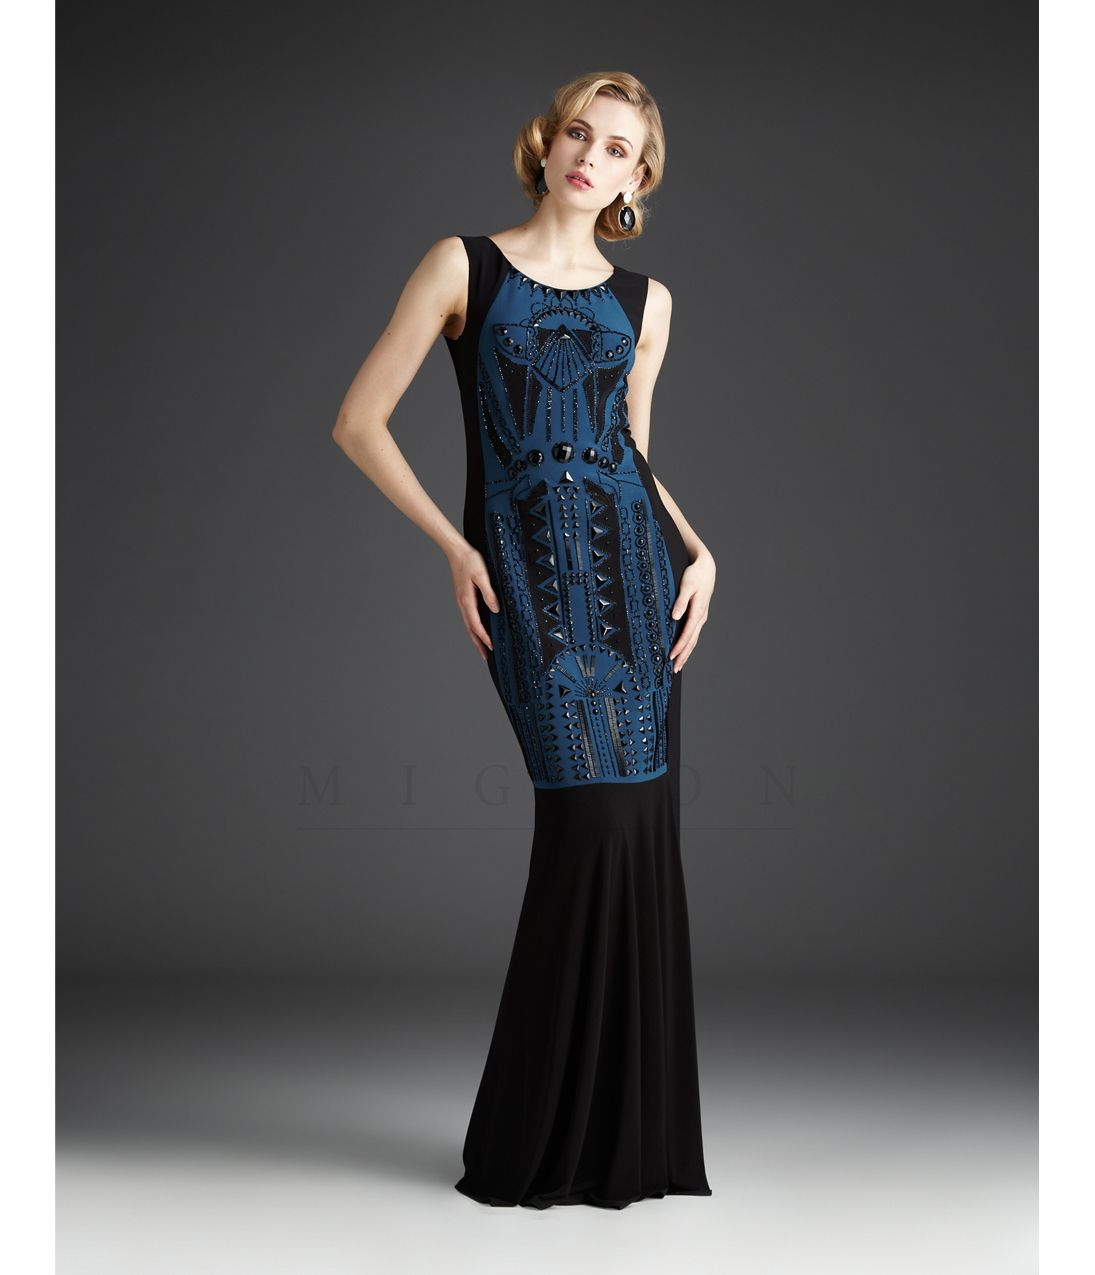 S formal dresses s formal dresses formal and teal